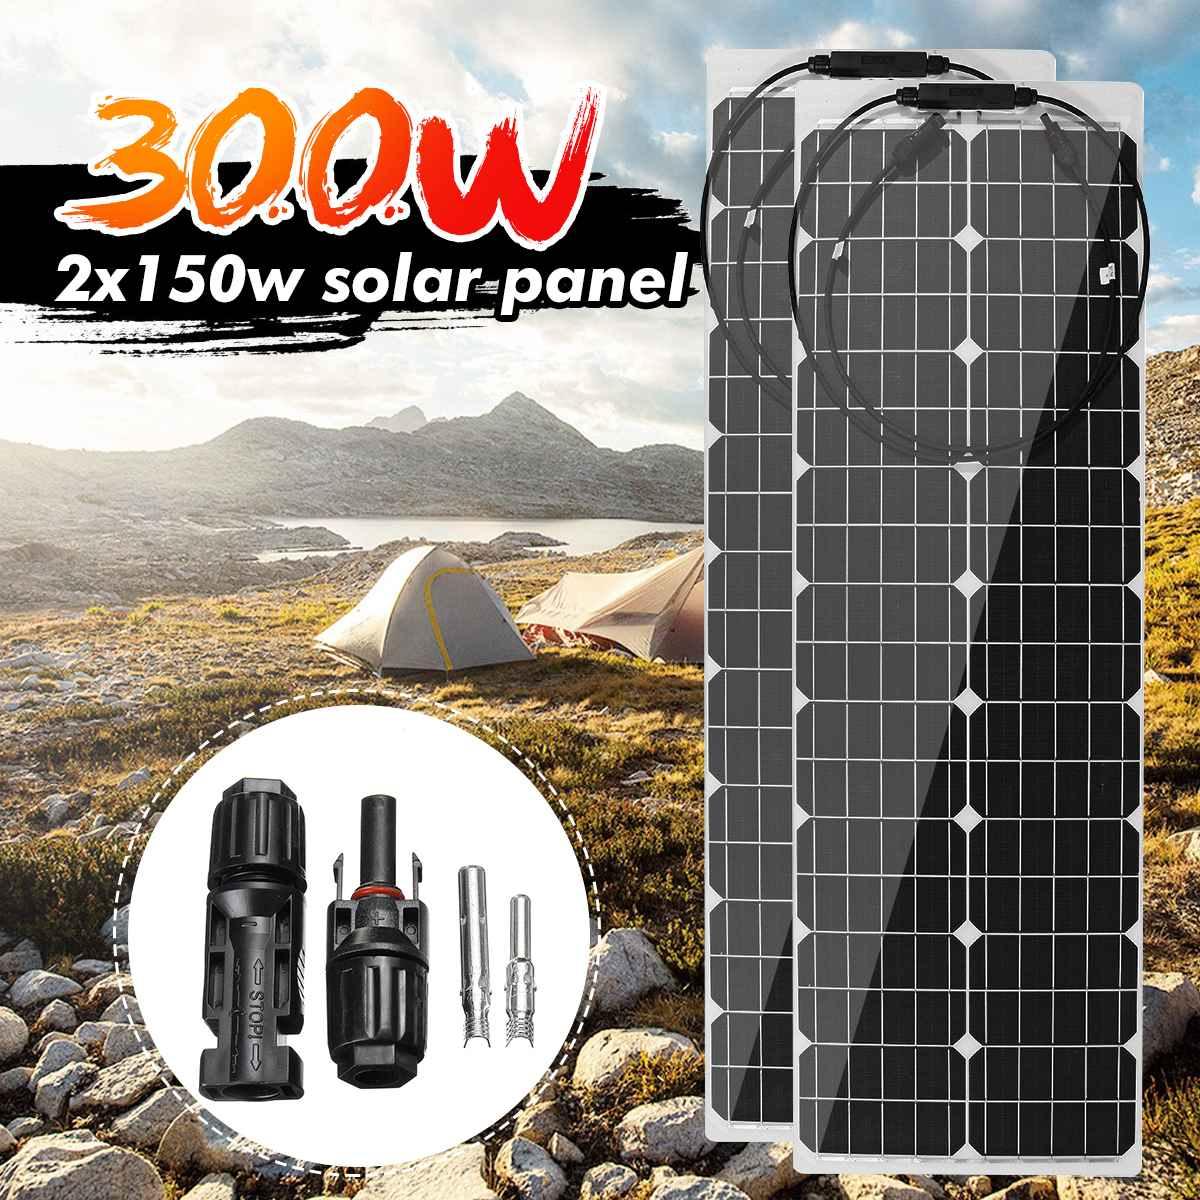 300W/150W 18V Solar Panel Semi-flexible Monokristalline Solarzelle DIY Kabel Wasserdicht Hause Im Freien stecker Batterie Ladegerät